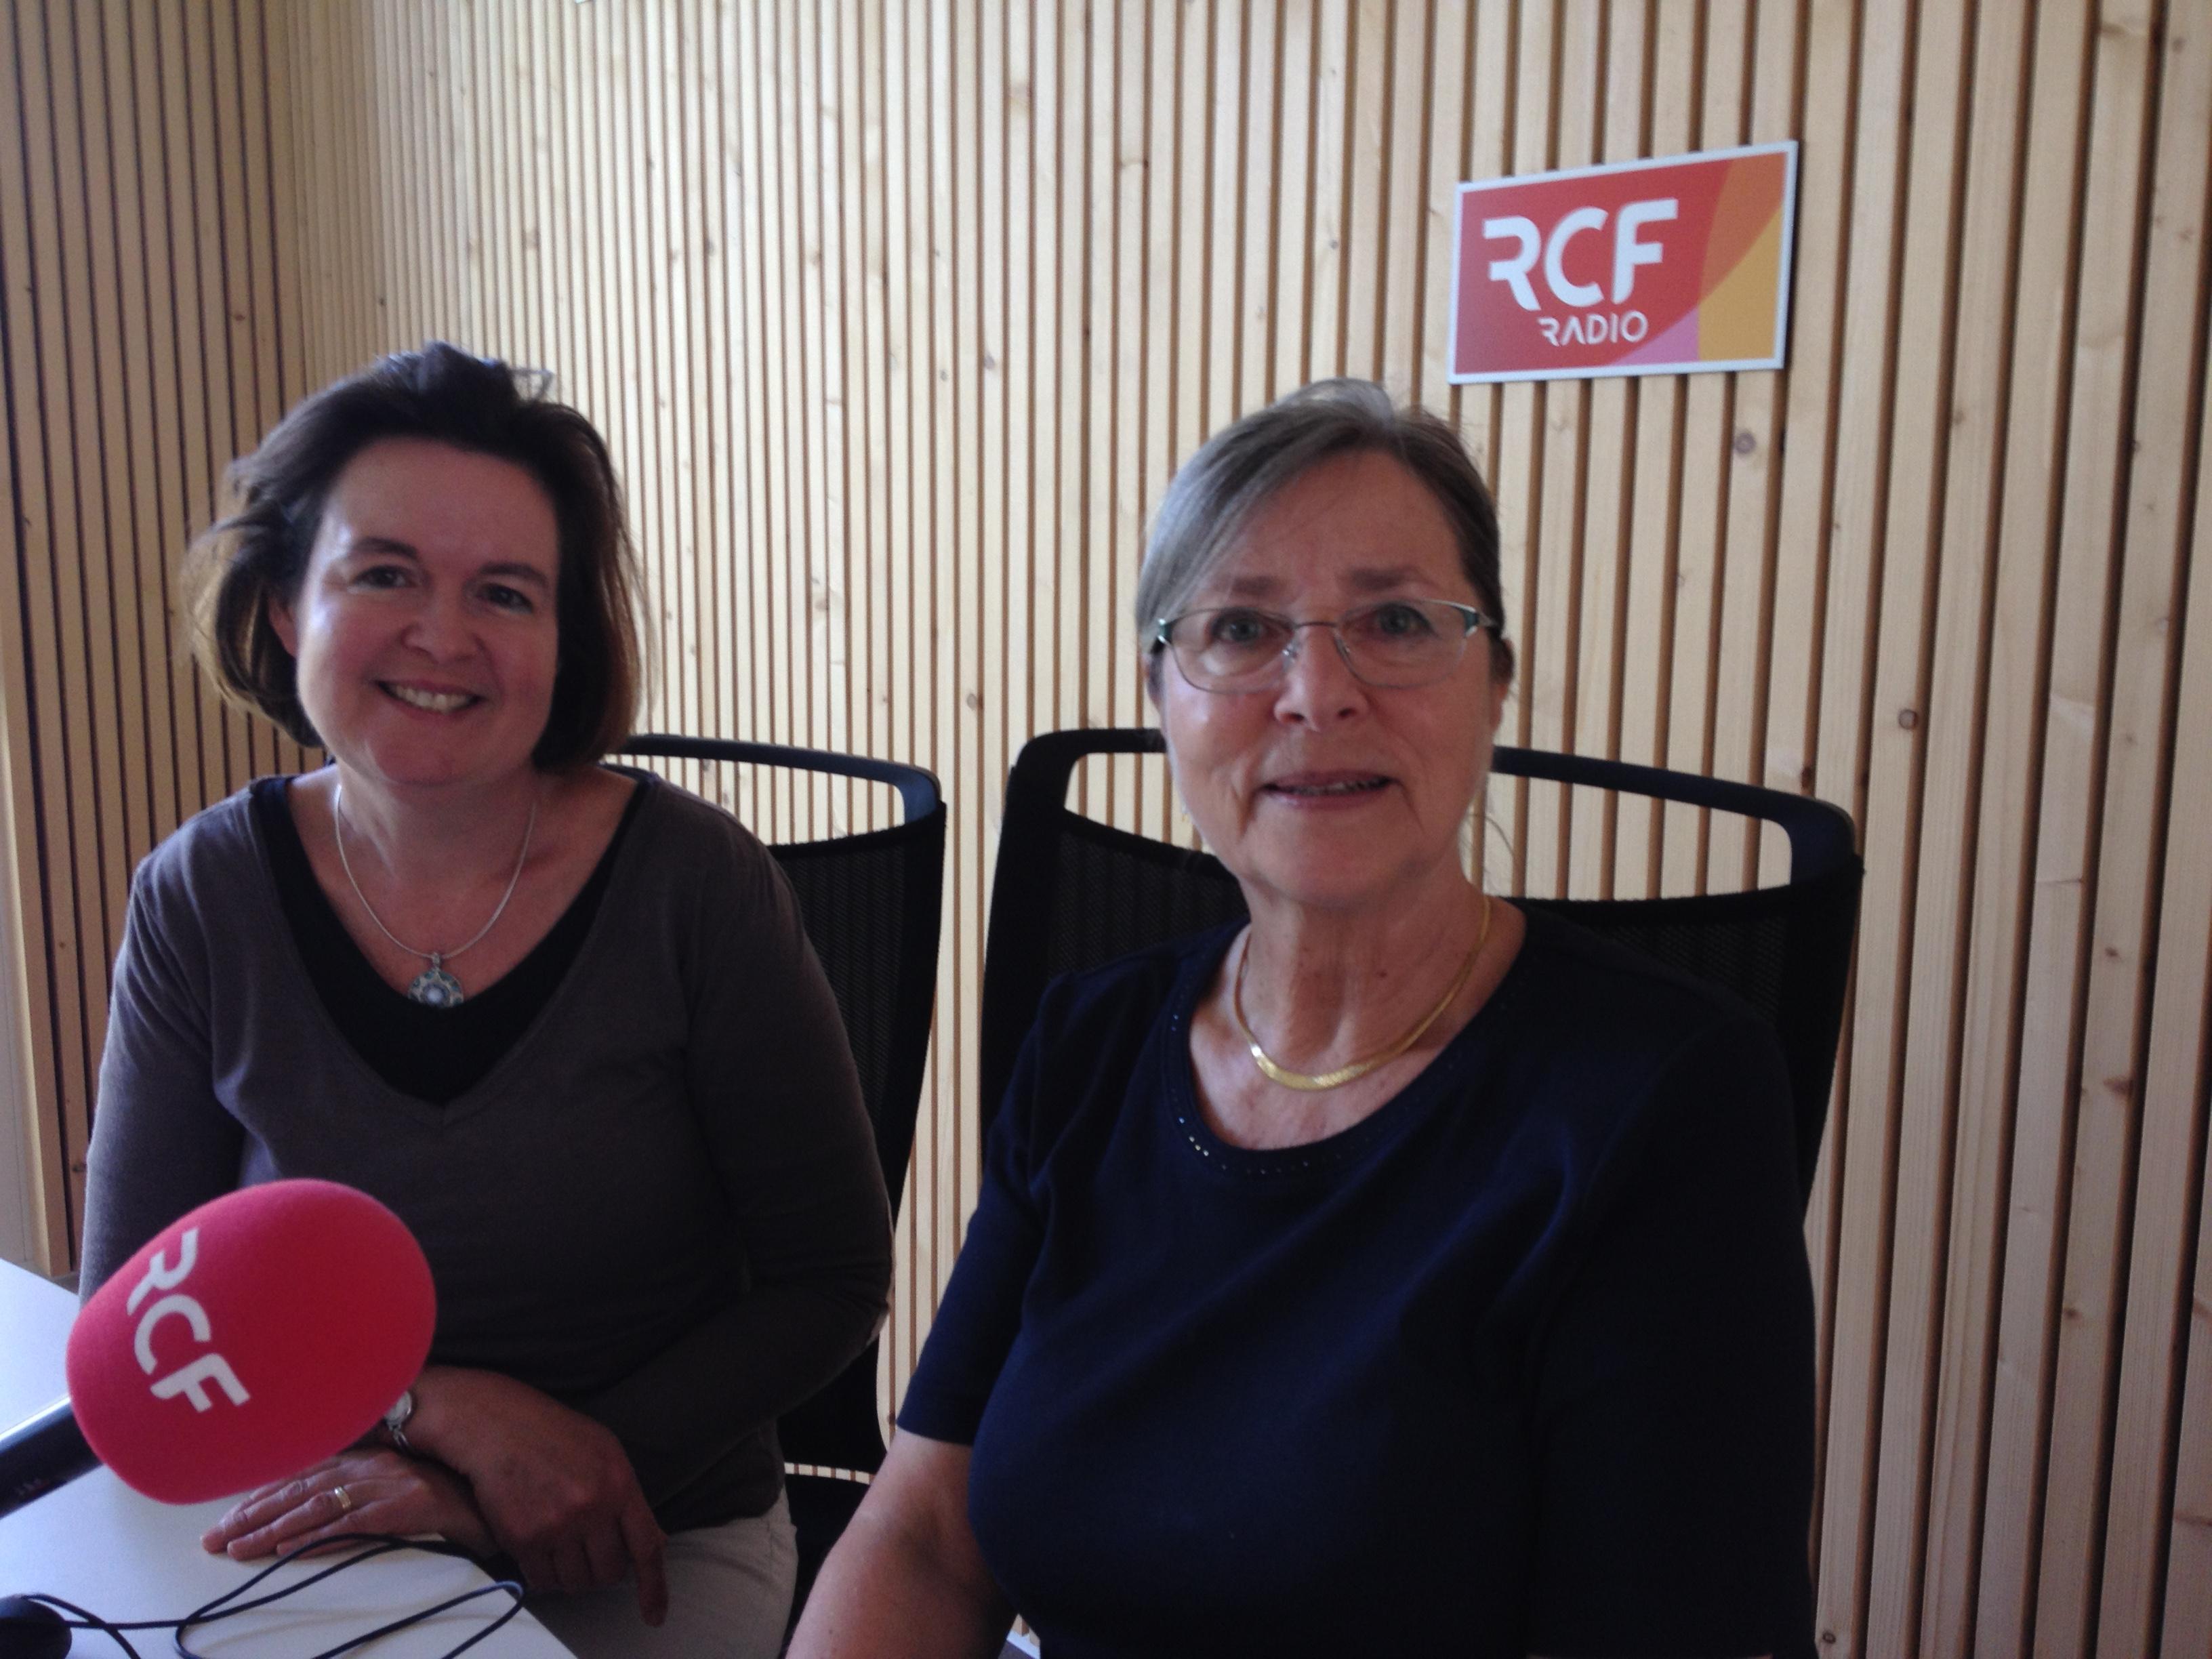 2017/05 – Radio RCF